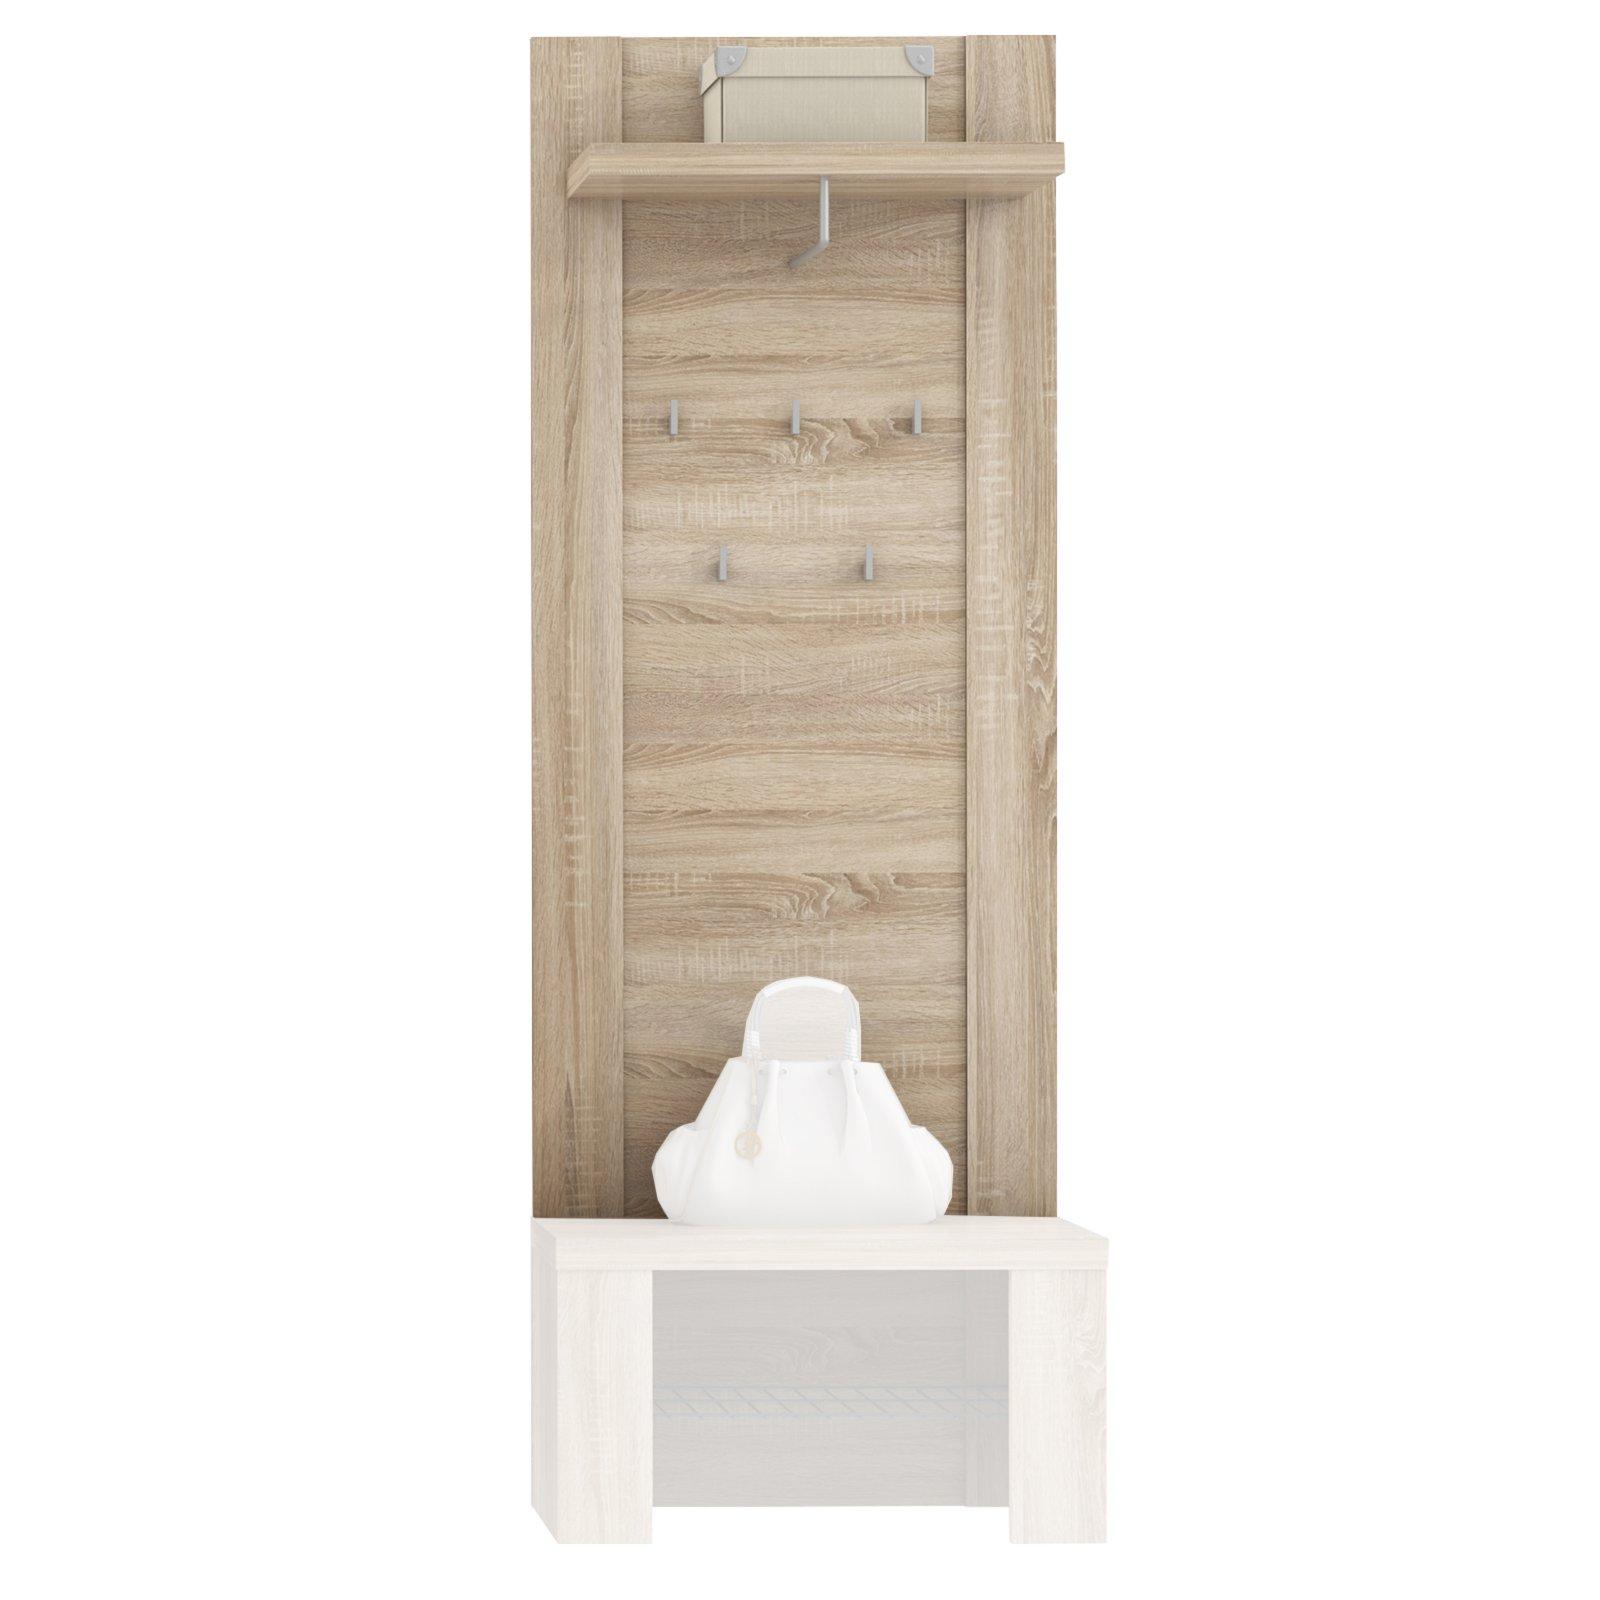 garderobenpaneel calpe sonoma eiche 70 cm wandgarderoben paneele flur diele. Black Bedroom Furniture Sets. Home Design Ideas